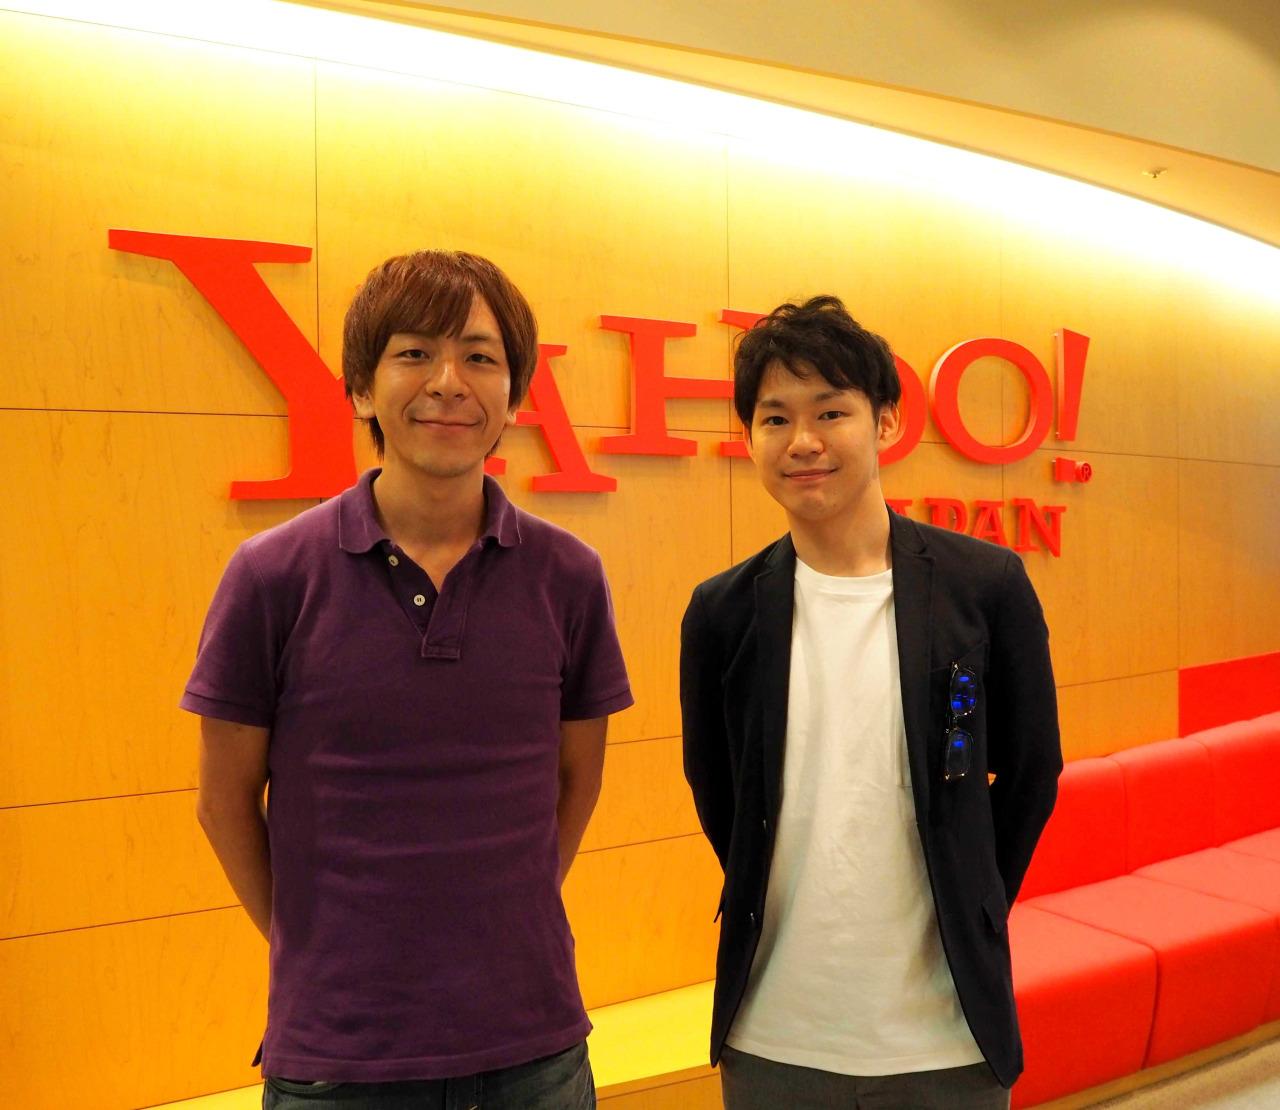 「Yahoo! JAPAN IDがあればすべてのサービスを使える世界」 ID連携システム改修プロジェクト